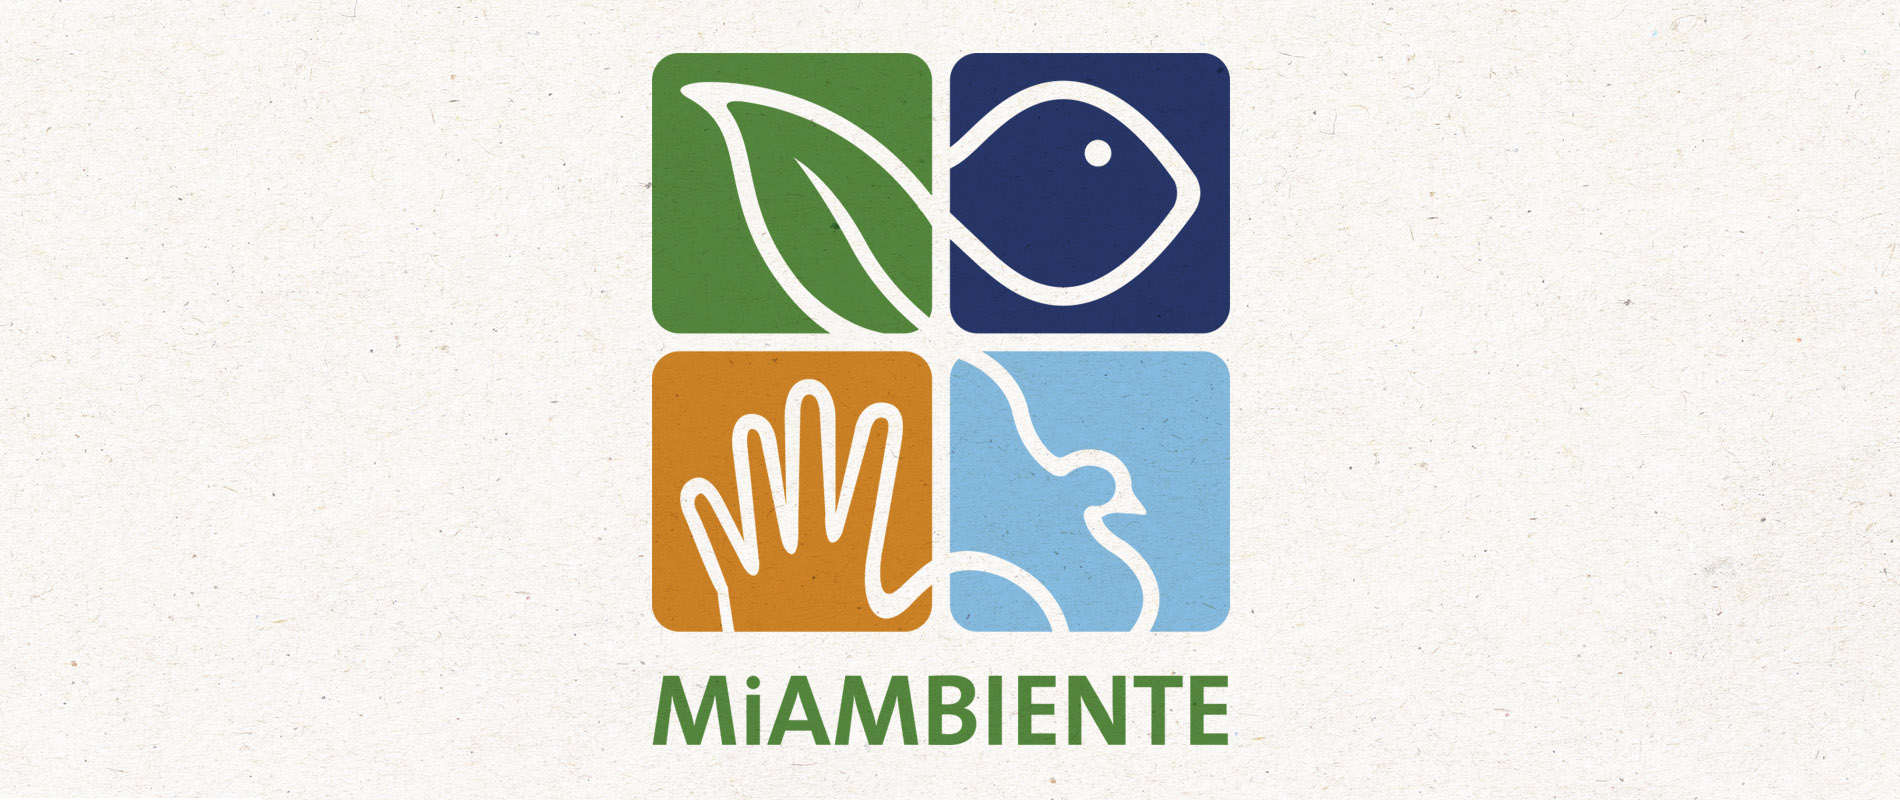 miambiente_orosman_logo_oo.jpg